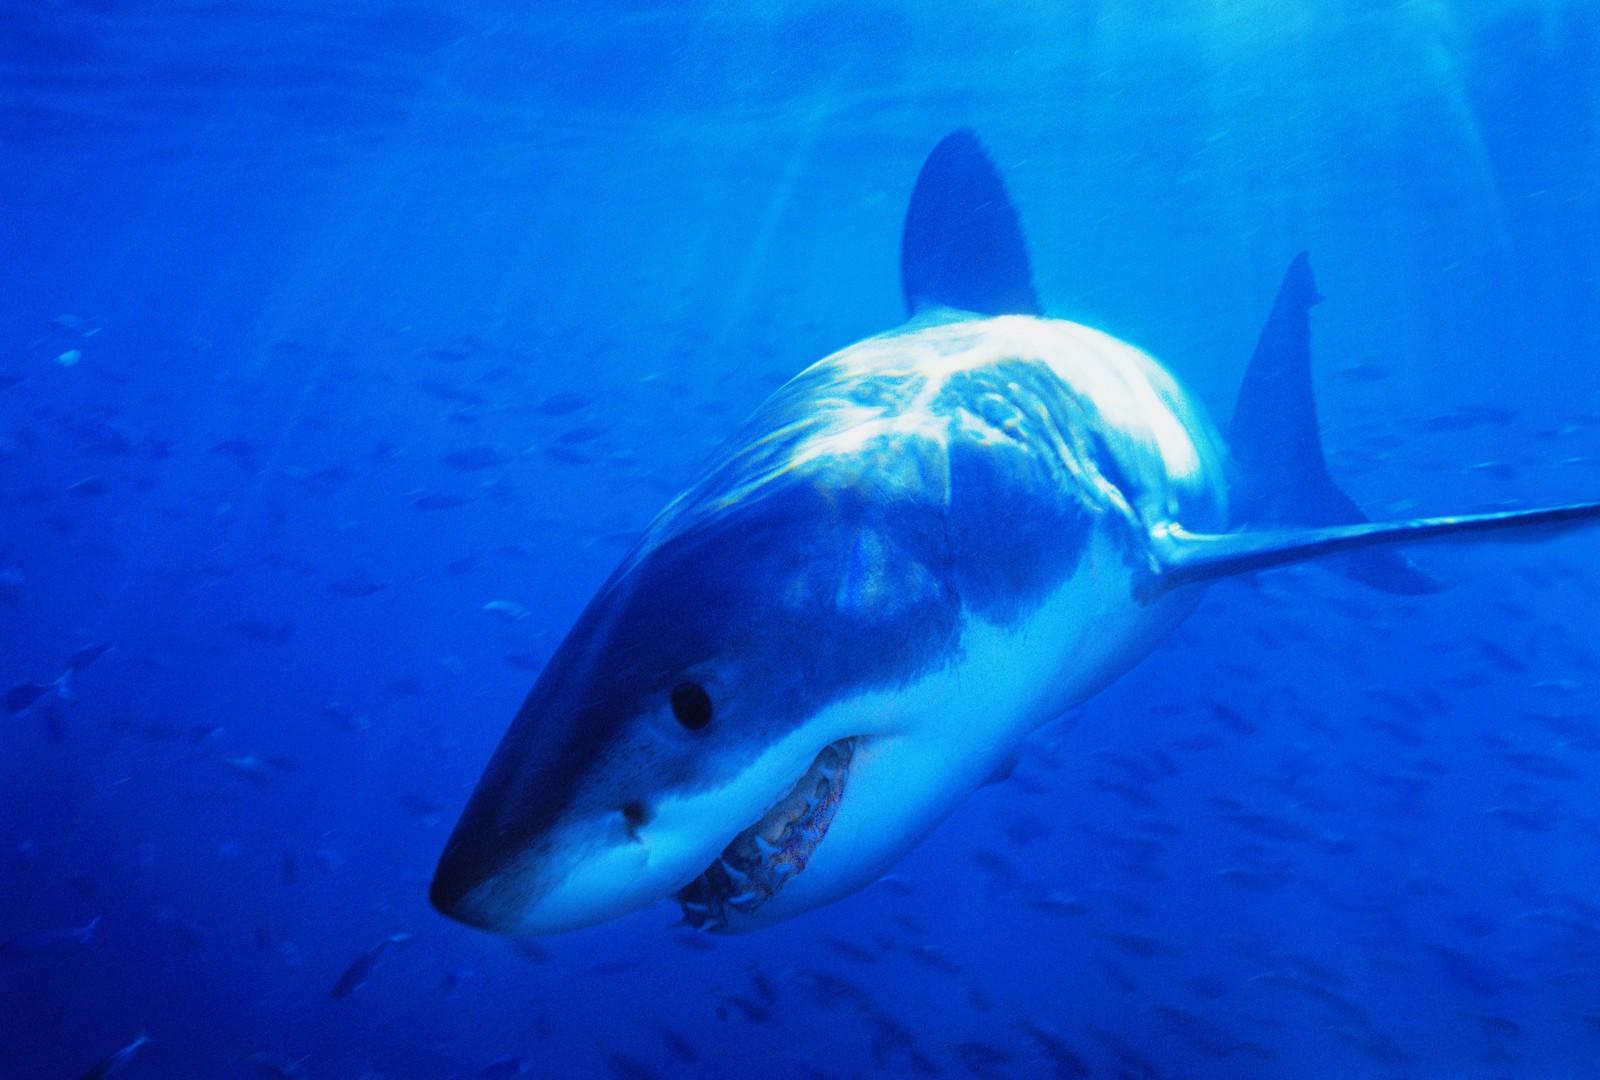 http://2.bp.blogspot.com/-fB50W4lfcaM/Tkgkh8BOAuI/AAAAAAAALOw/yLRVUdfkUmQ/s1600/Sharks+and+Killer+Whales+Wallpaper+%252815%2529.JPG